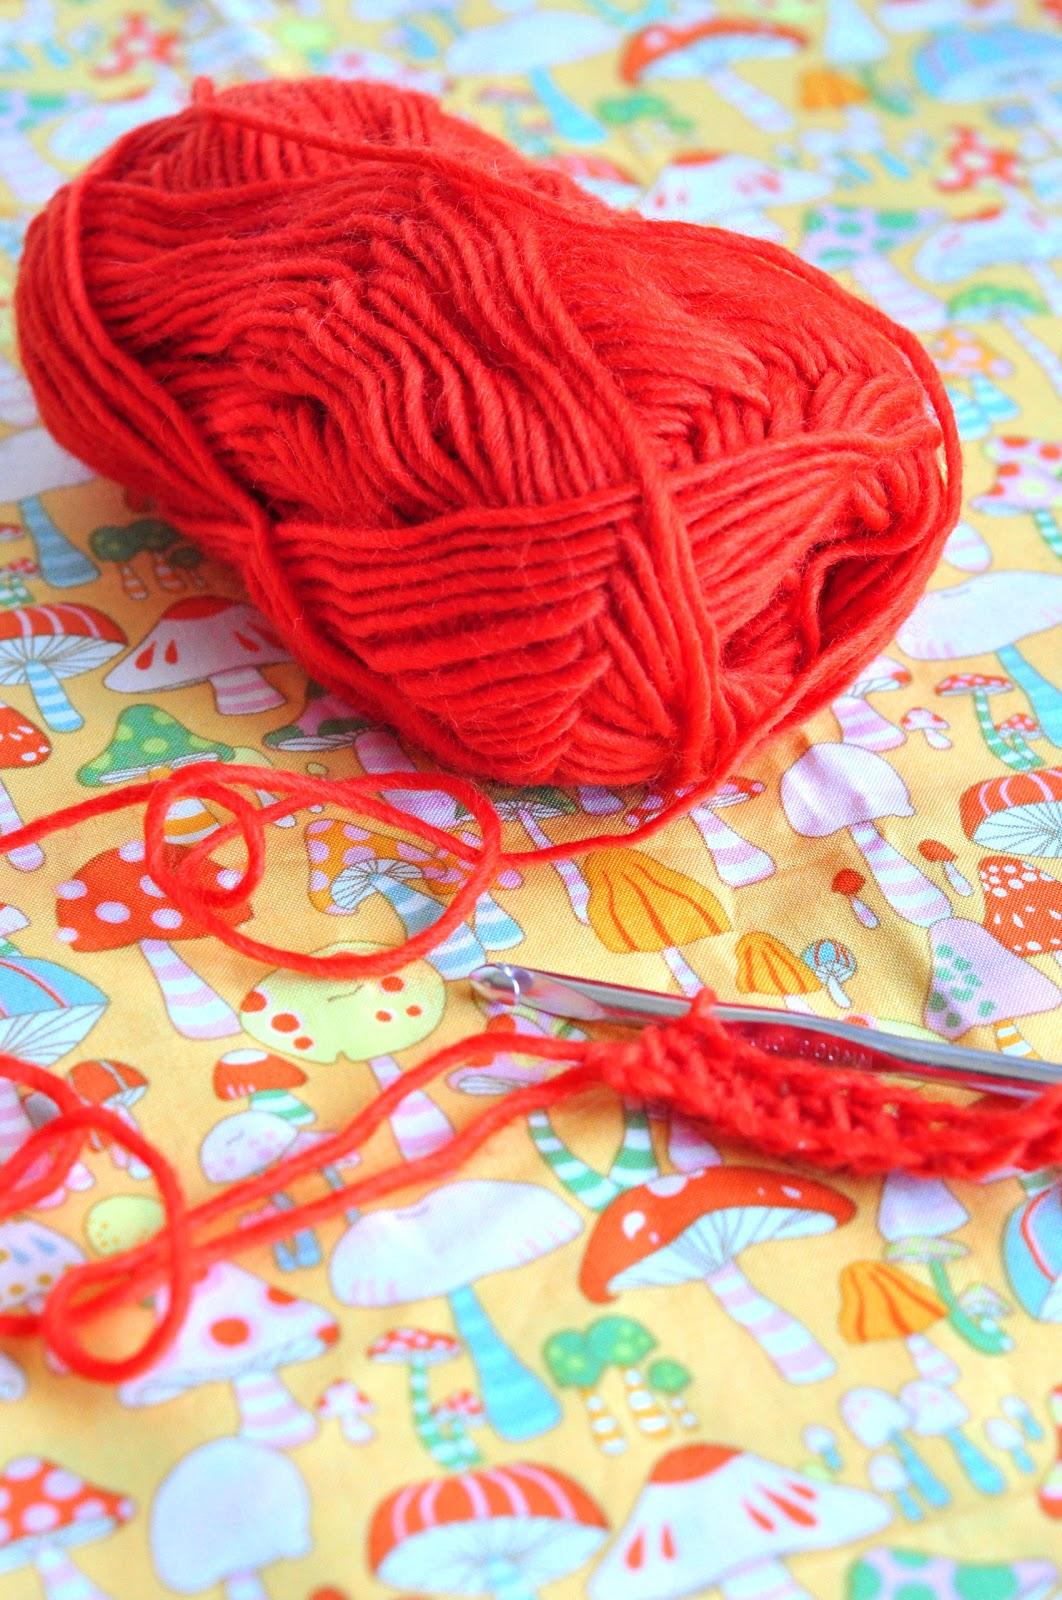 Crochet Hdc : Aesthetic Nest: How to Crochet 8: The Half Double Crochet (Tutorial)